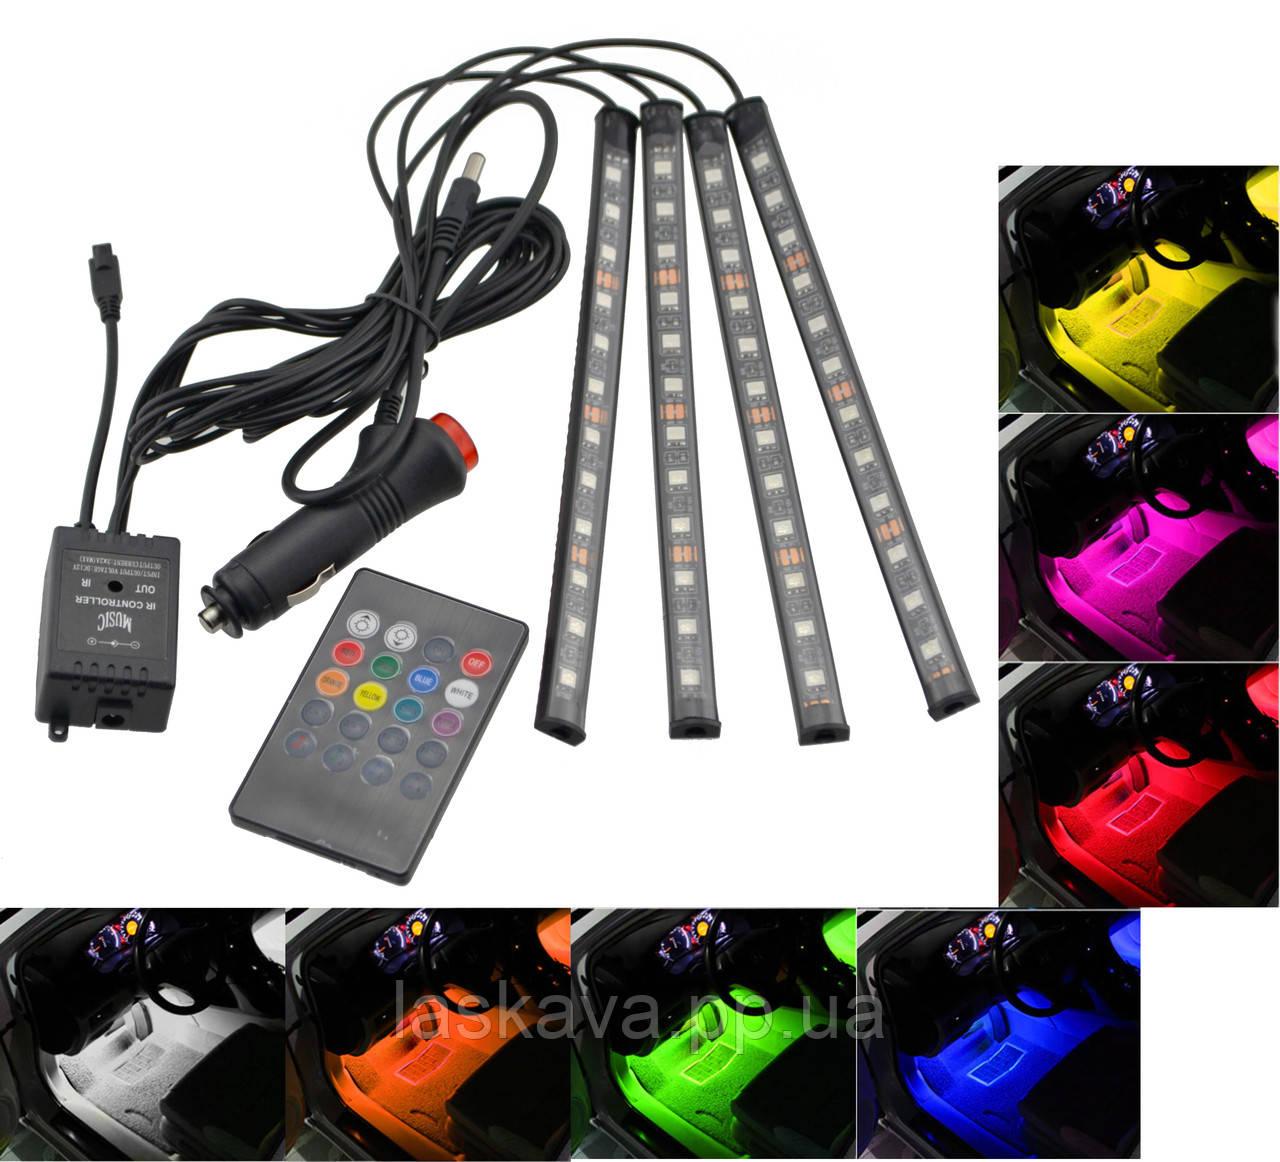 Цветная подсветка для авто водонепроницаемая RGB led HR-01678 (3306) Siamo